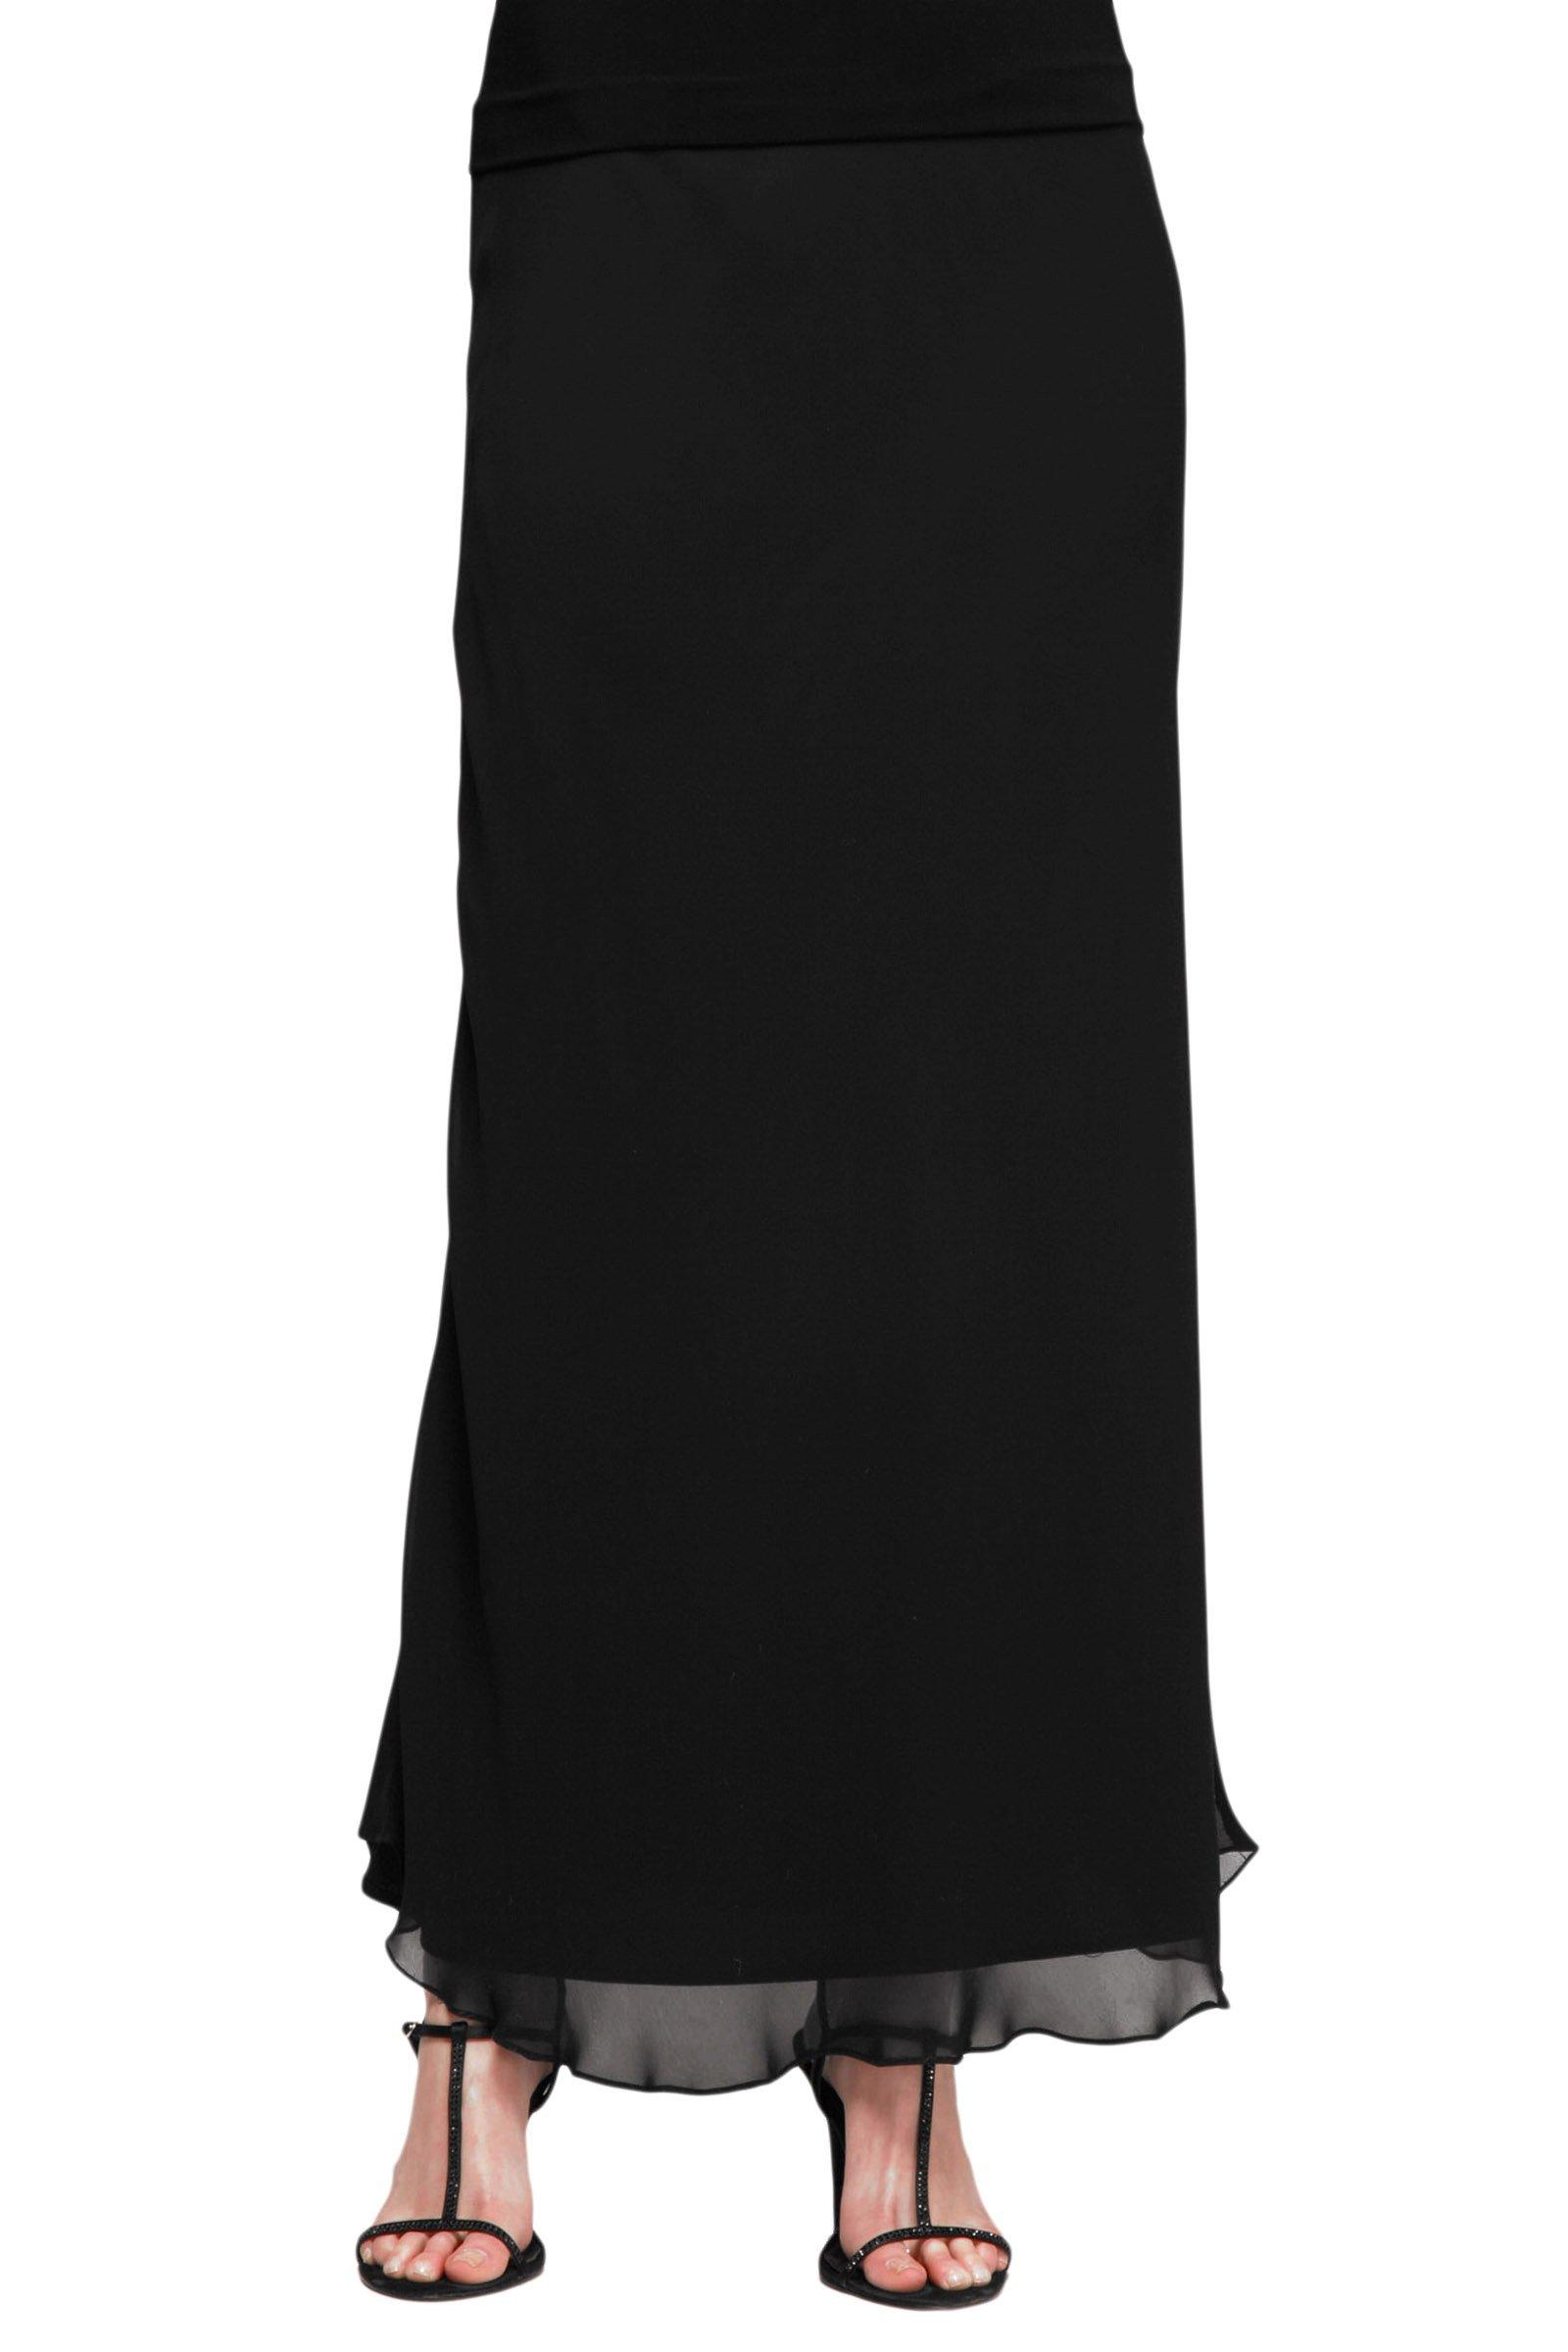 Alex Evenings Women's Long Skirt Various Styles (Petite and Regular Sizes), Black Chiffon A, MP by Alex Evenings